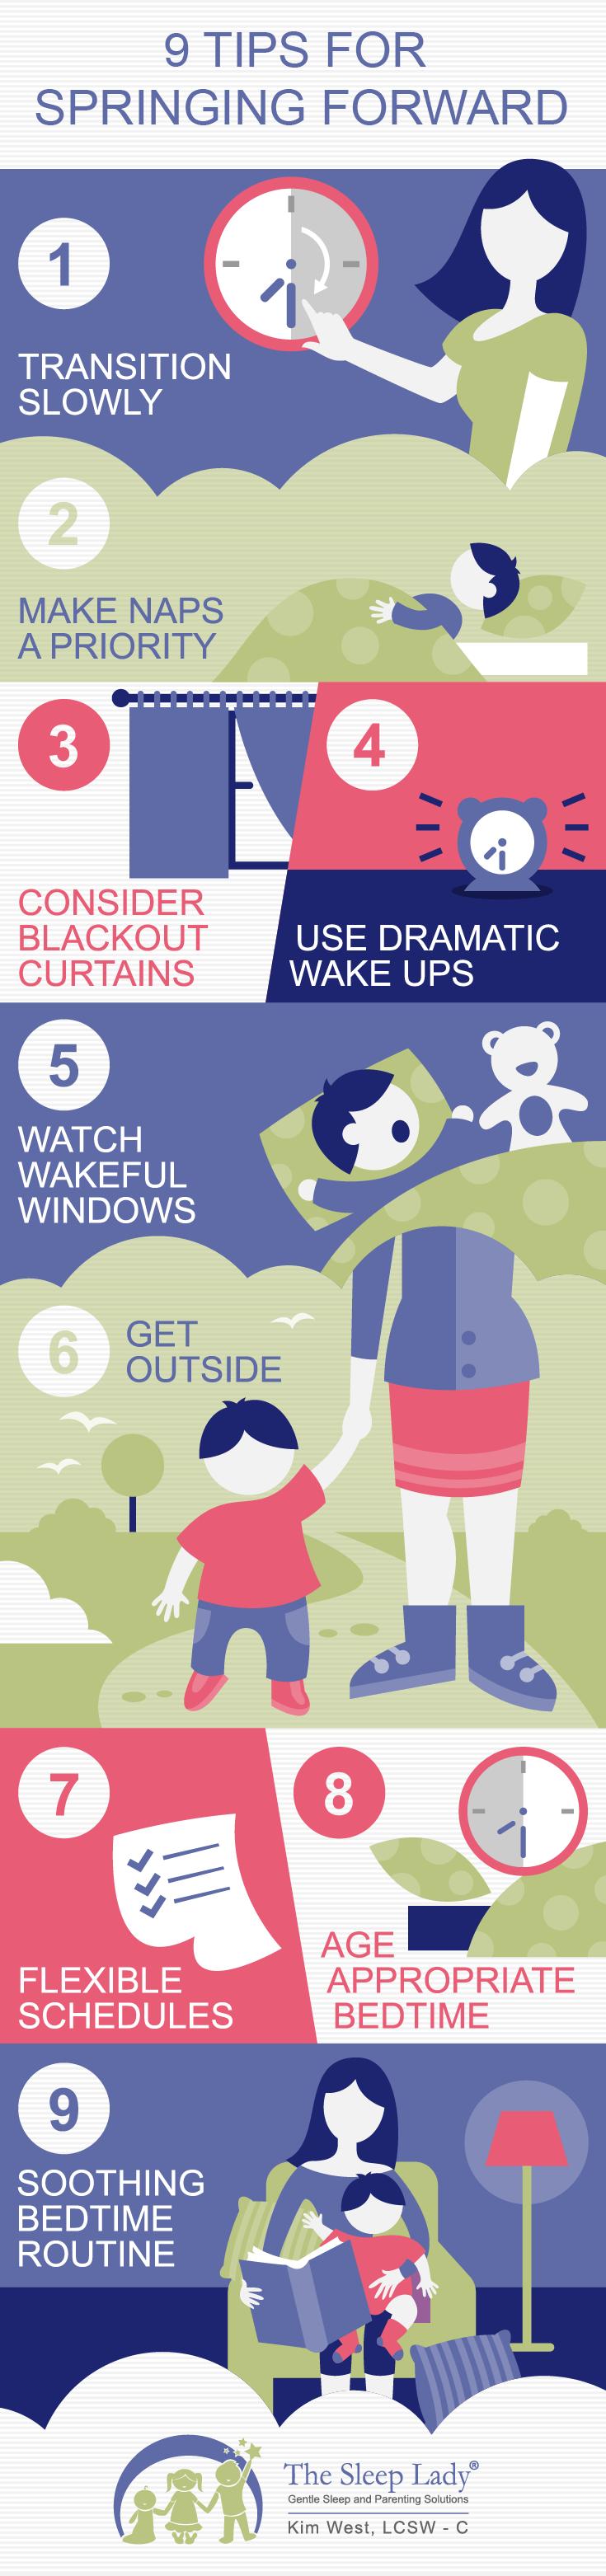 daylight saving tips